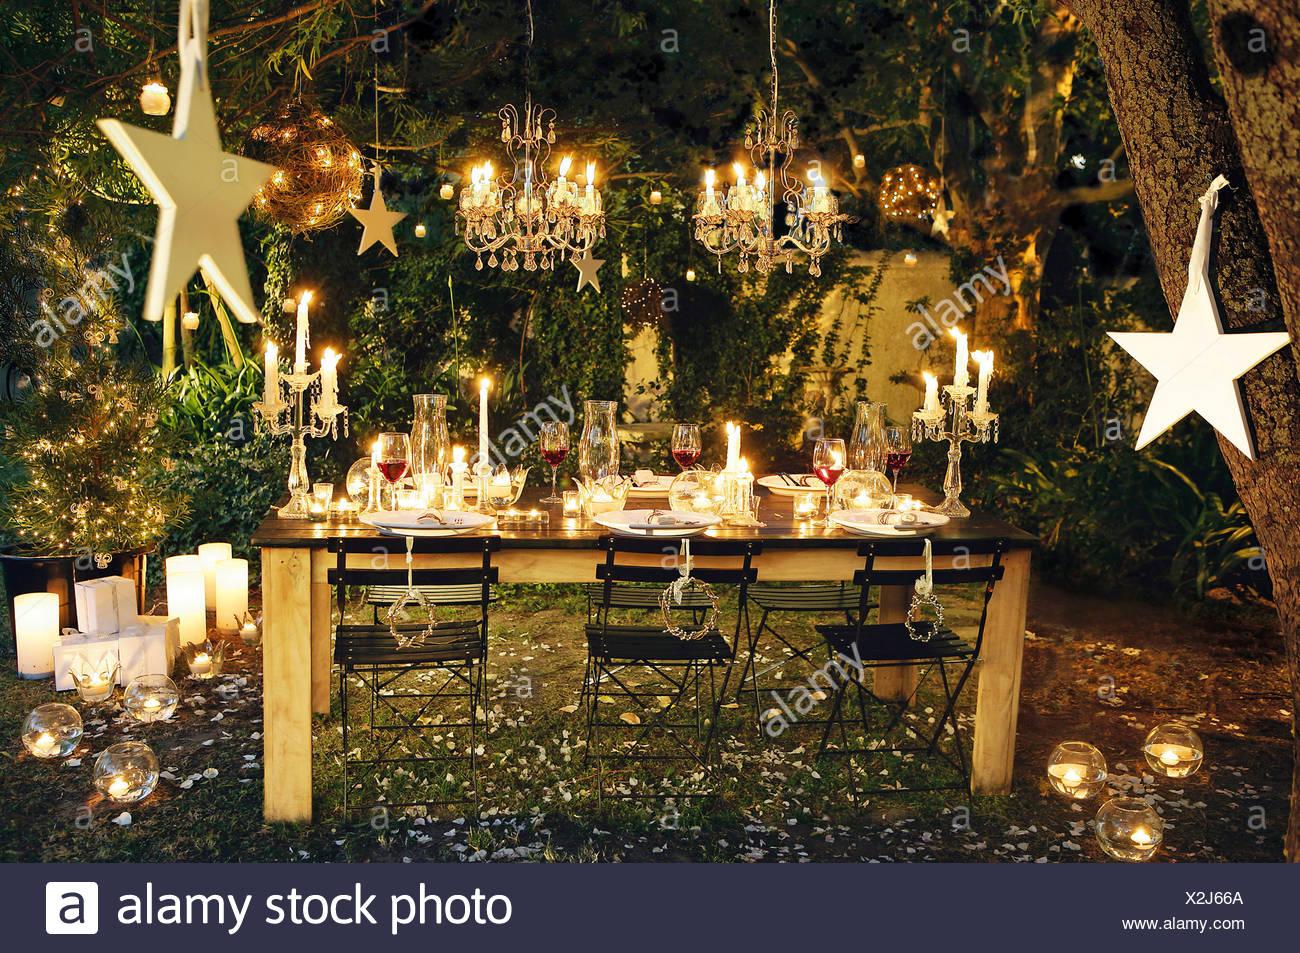 Outdoor Lights Candles Fairy Lights Stock Photos & Outdoor Lights ...